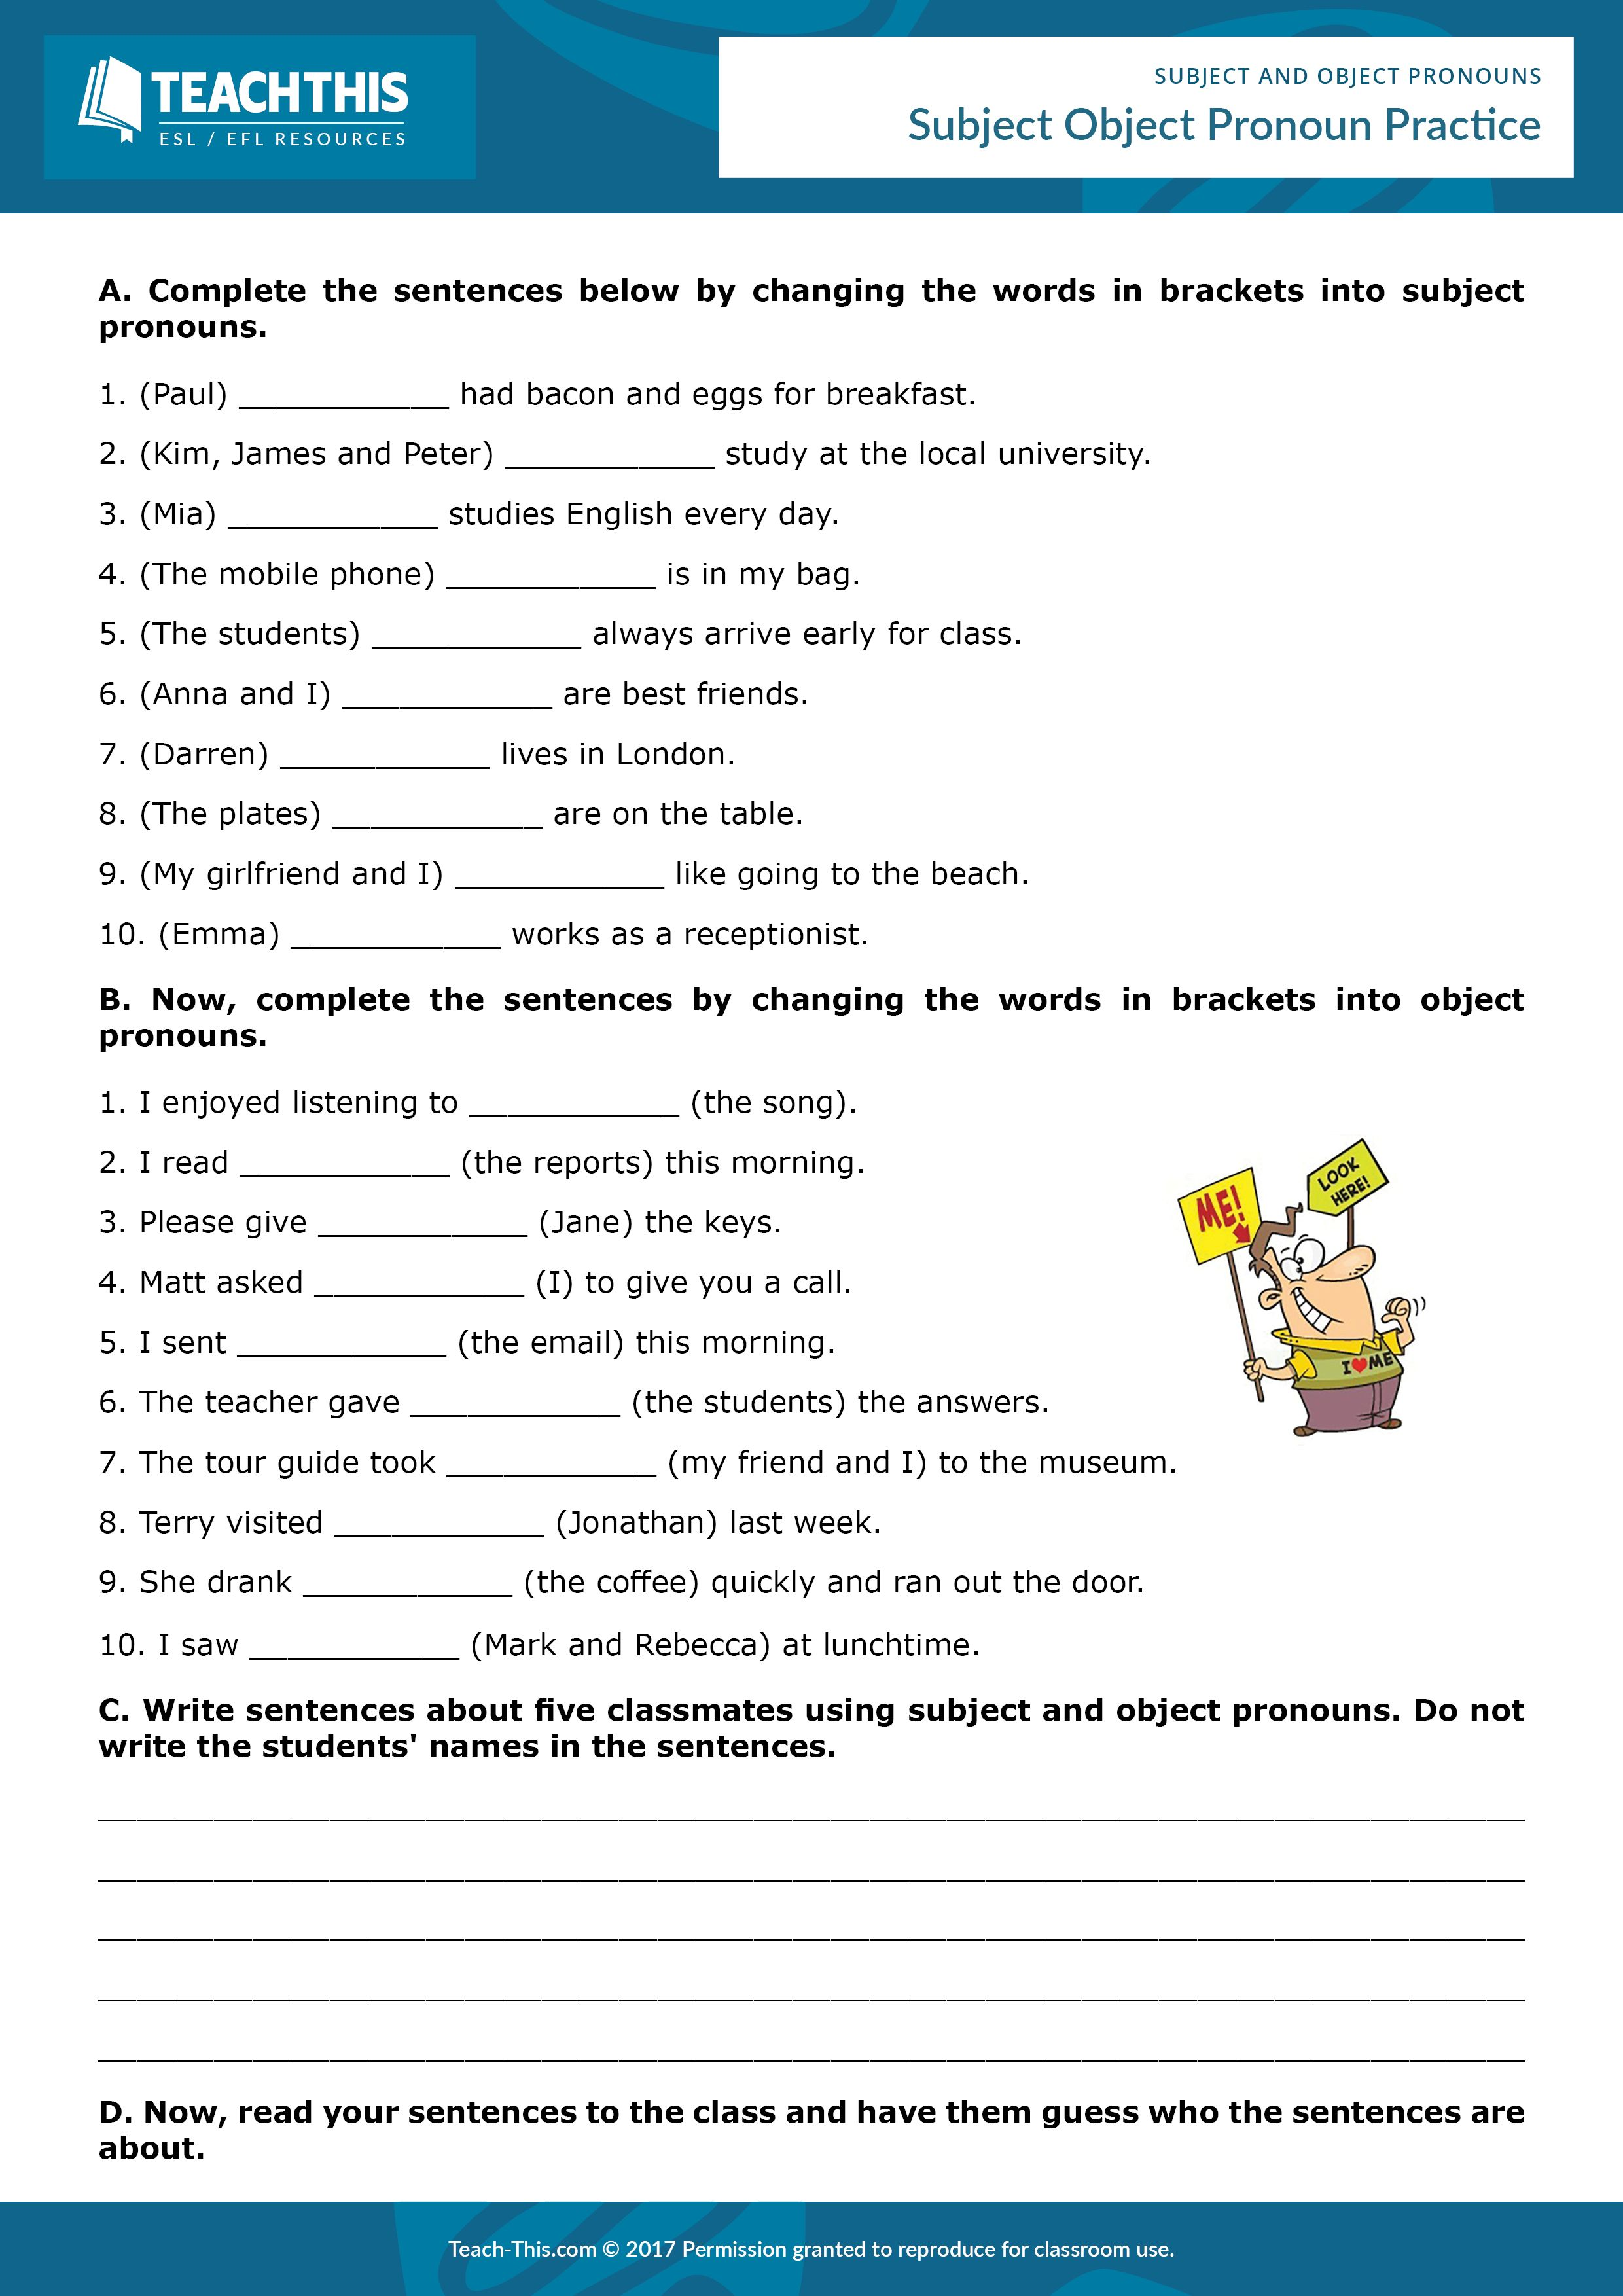 Subject and Object Pronouns Object pronouns, Teaching